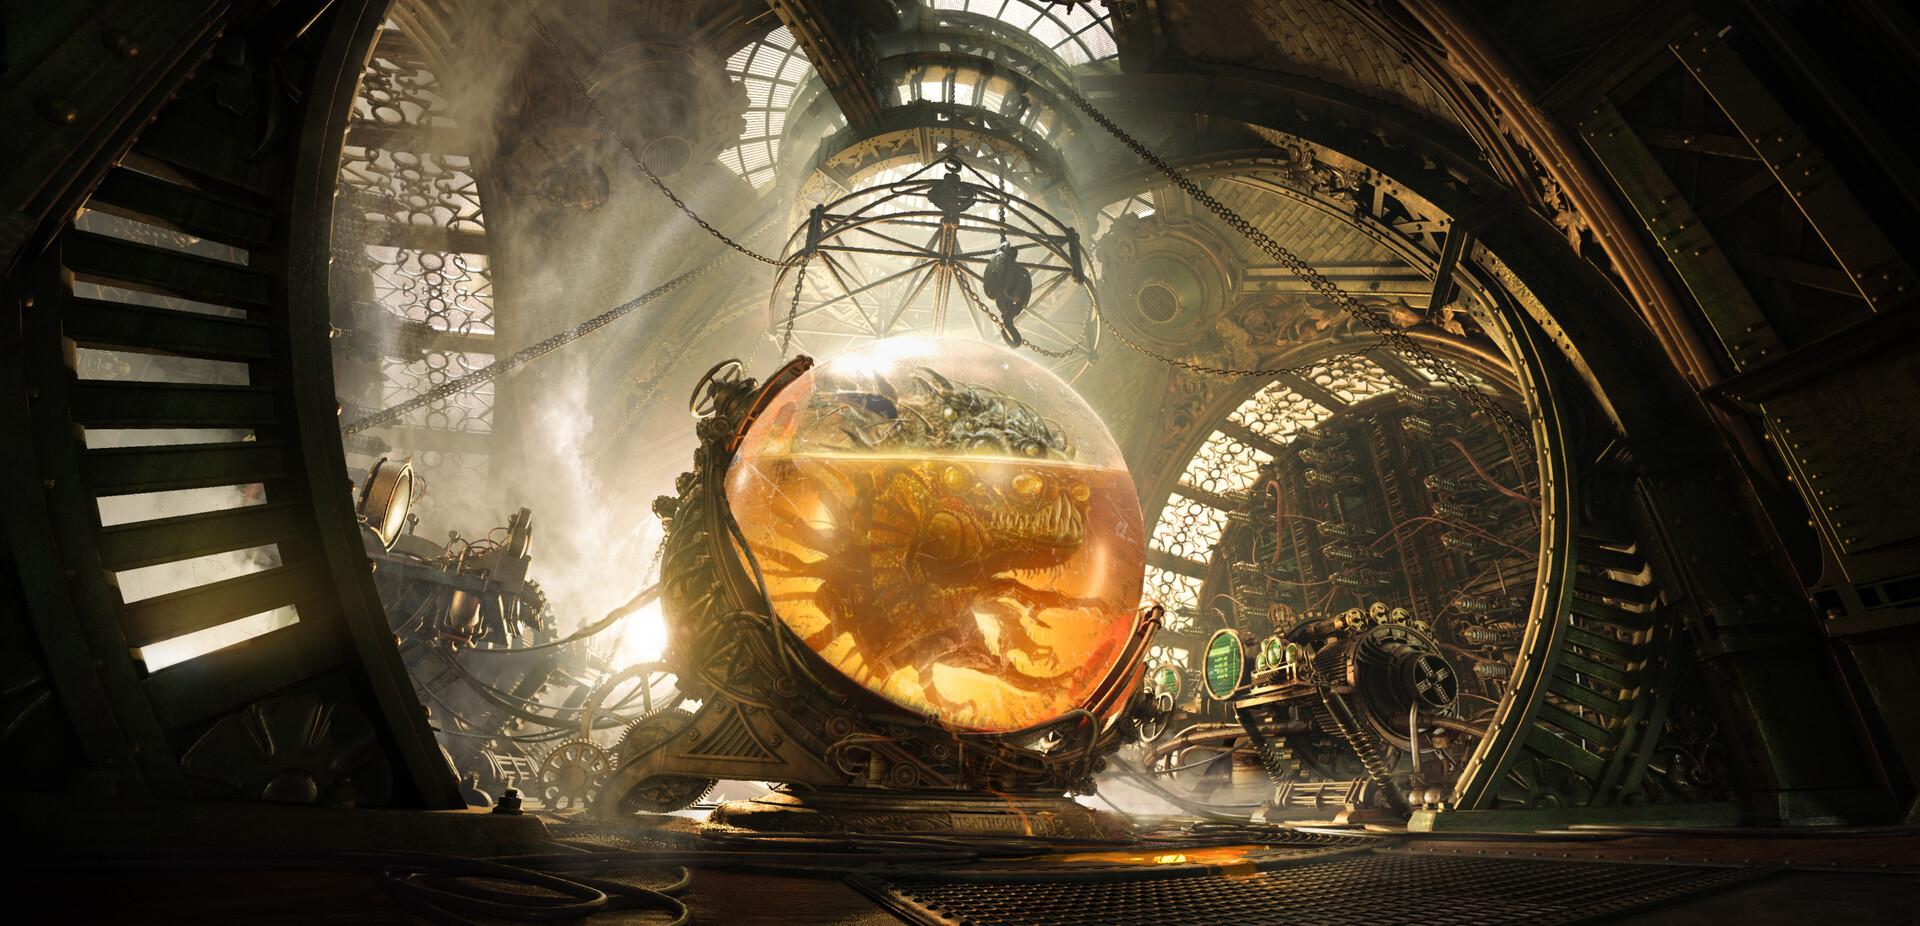 The Cinematic Sci-Fi Art of Guillaume Berthoumieu